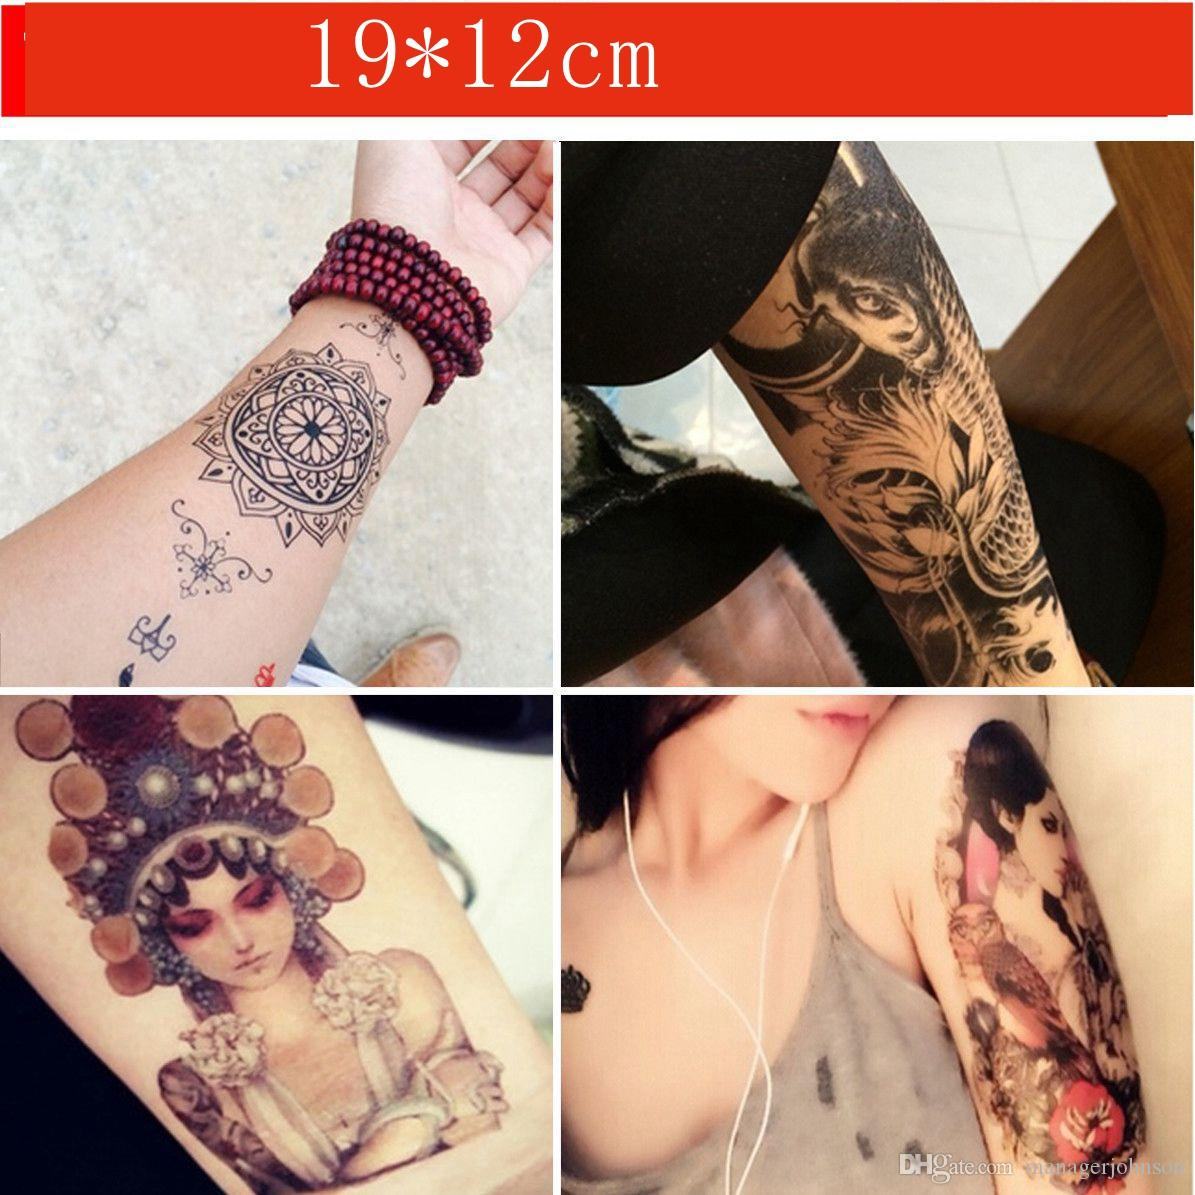 Tatuajes Temporales Impermeable Flor Brazo Esqueleto Humano Carpa Y